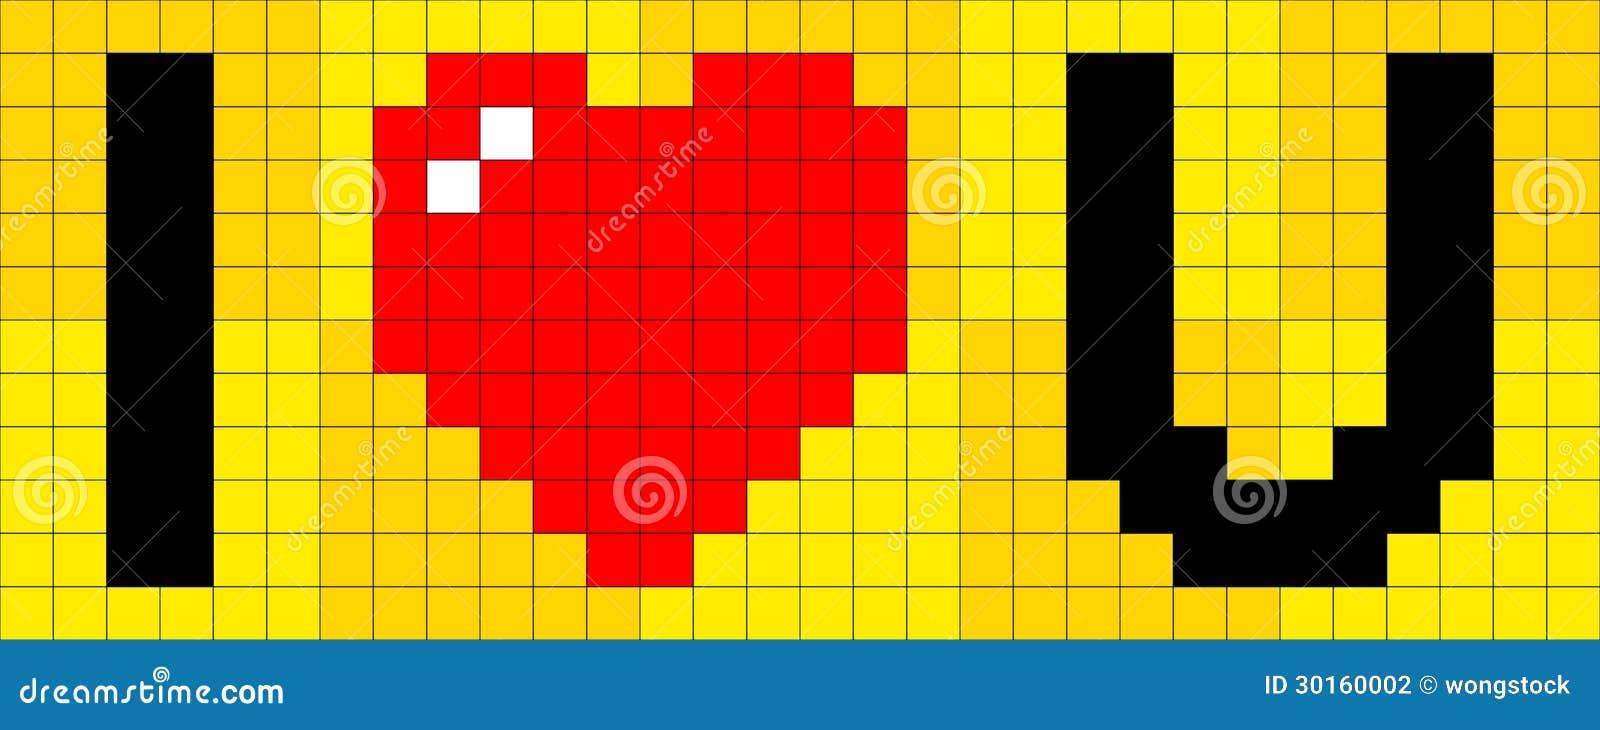 8 bit heart love clipart  RoyaltyFree Vector Graphic